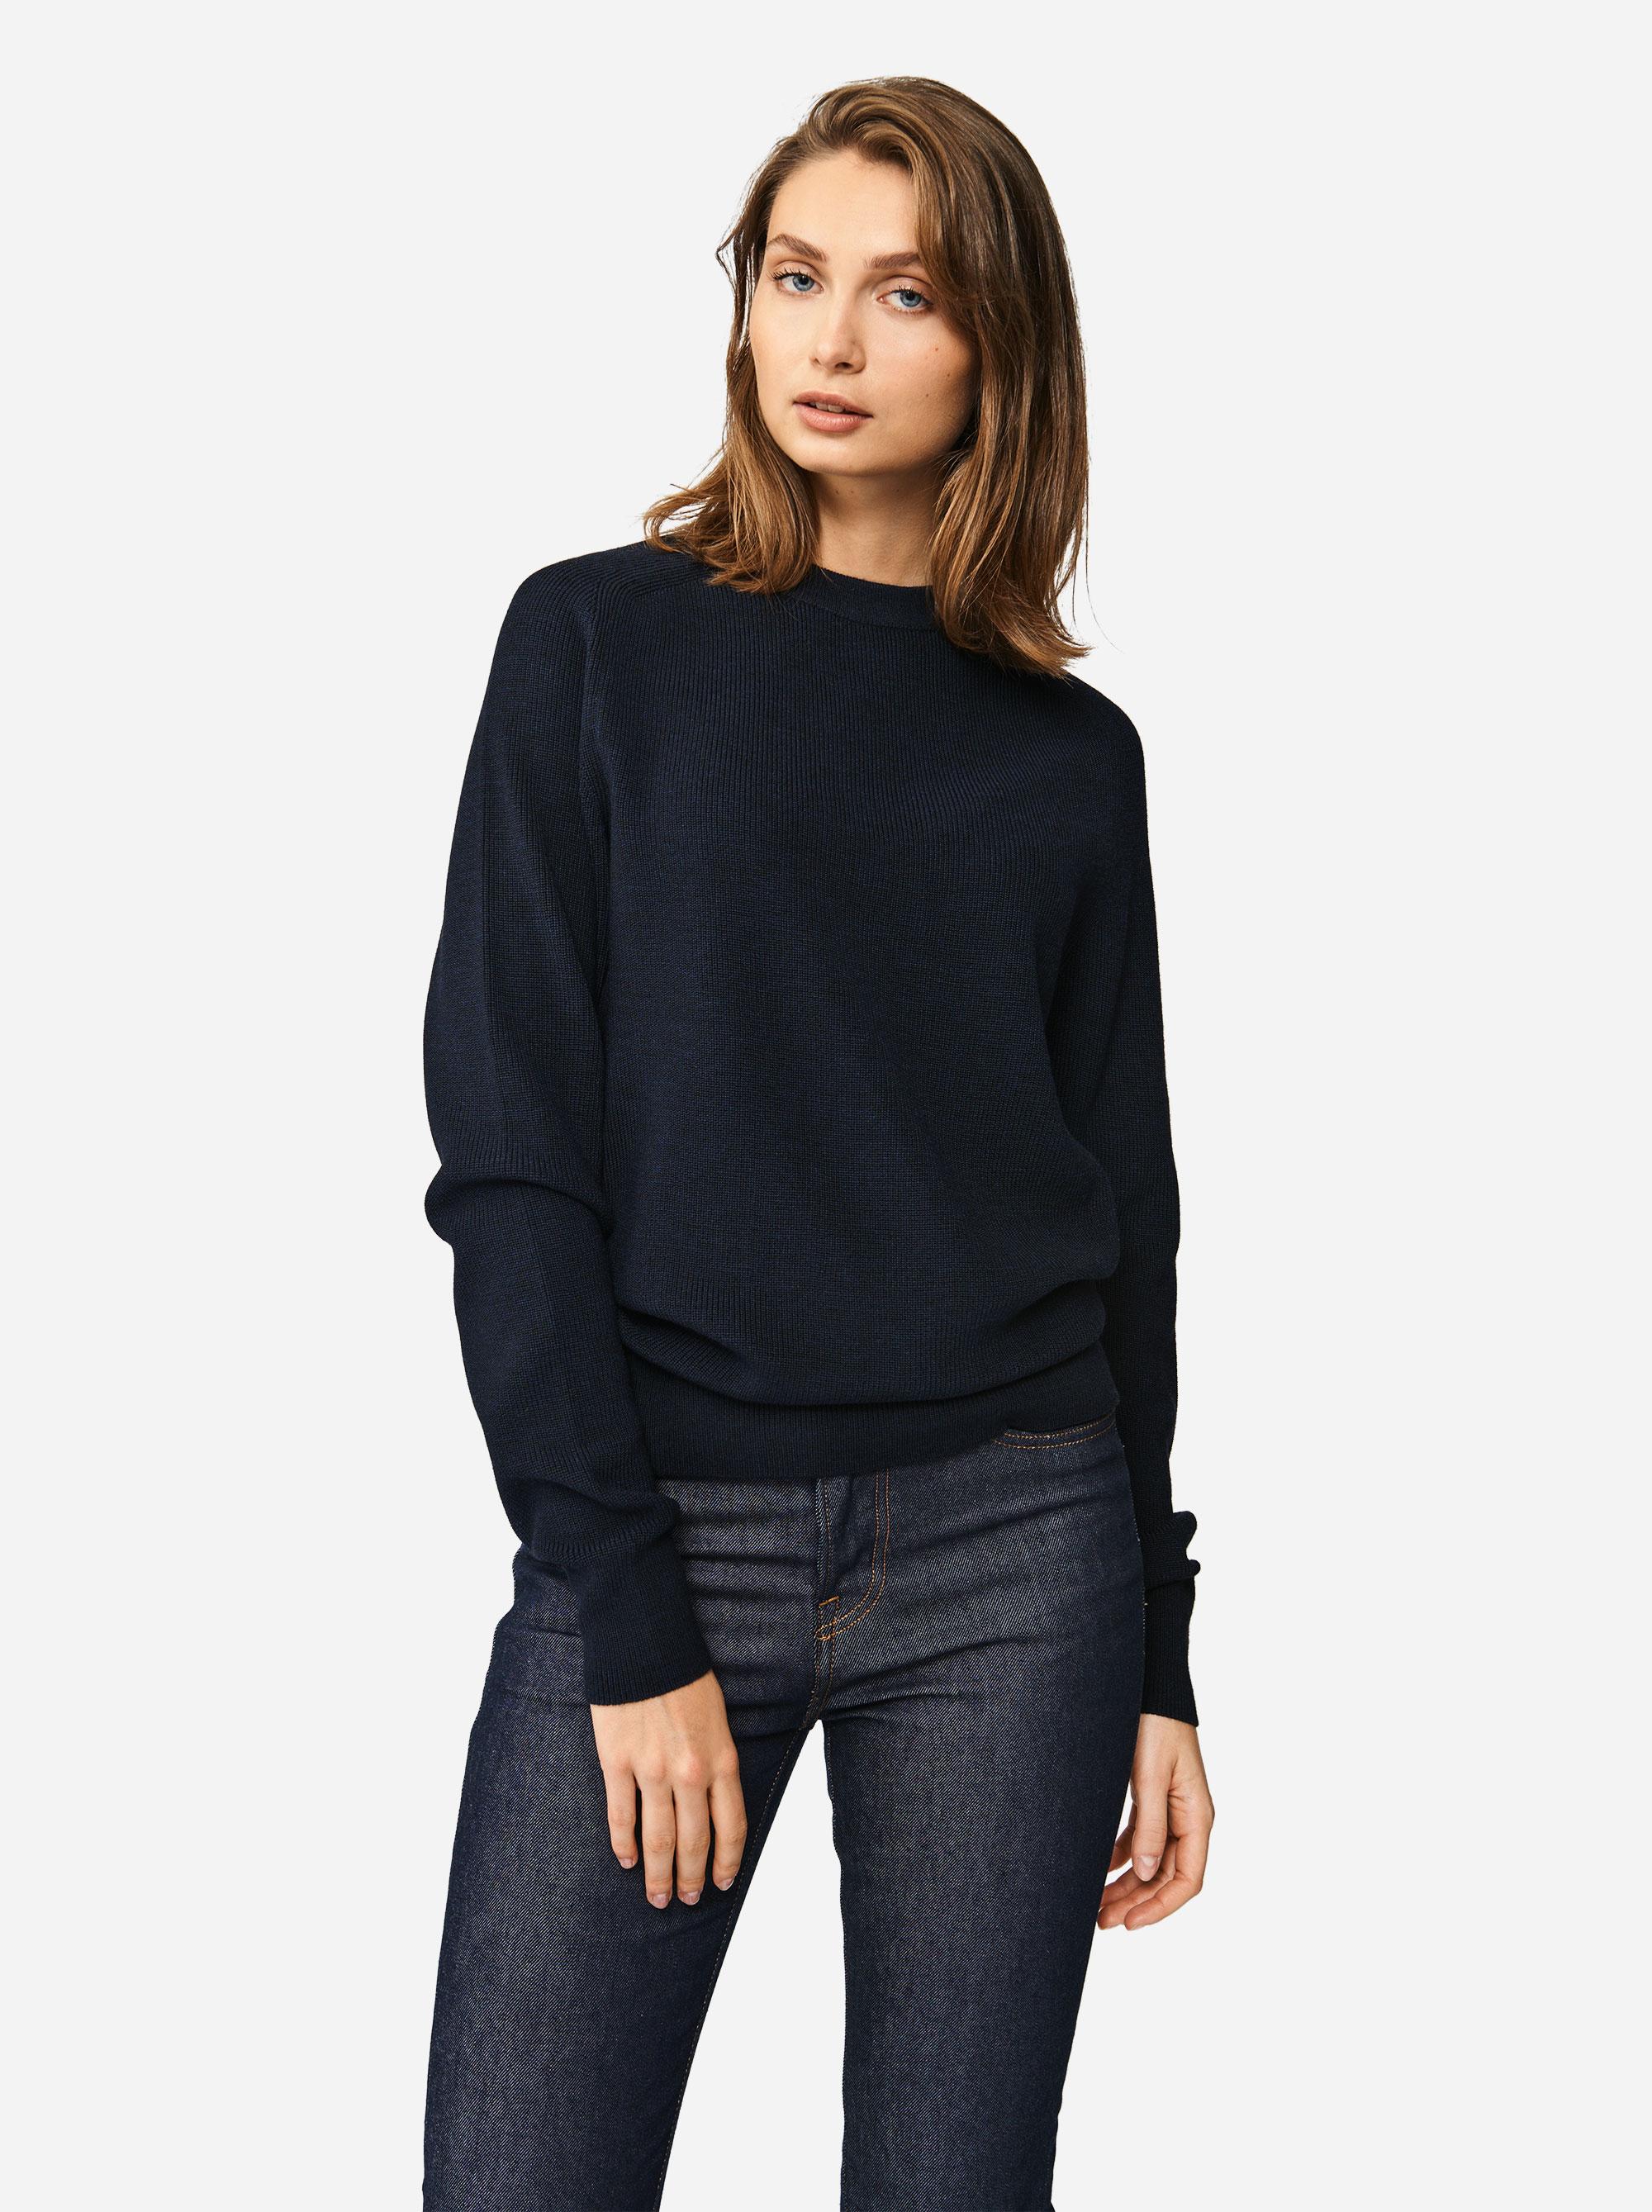 Teym - Crewneck - The Merino Sweater - Women - Blue - 2